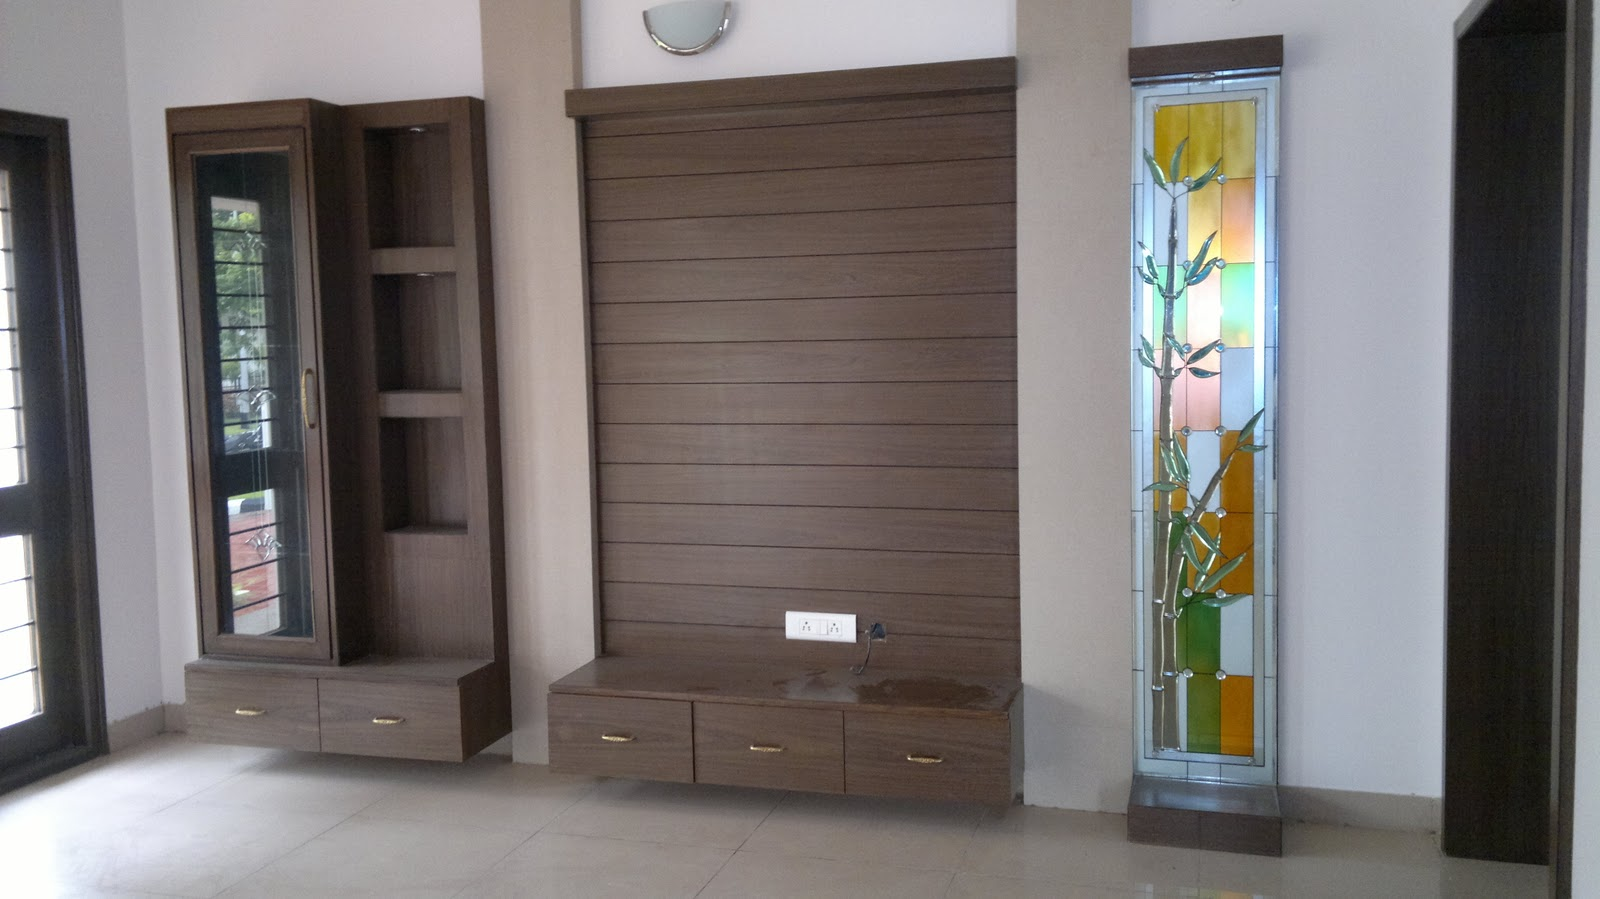 Kids Room Furniture - Home Design Interior Decoration aa6dfab60